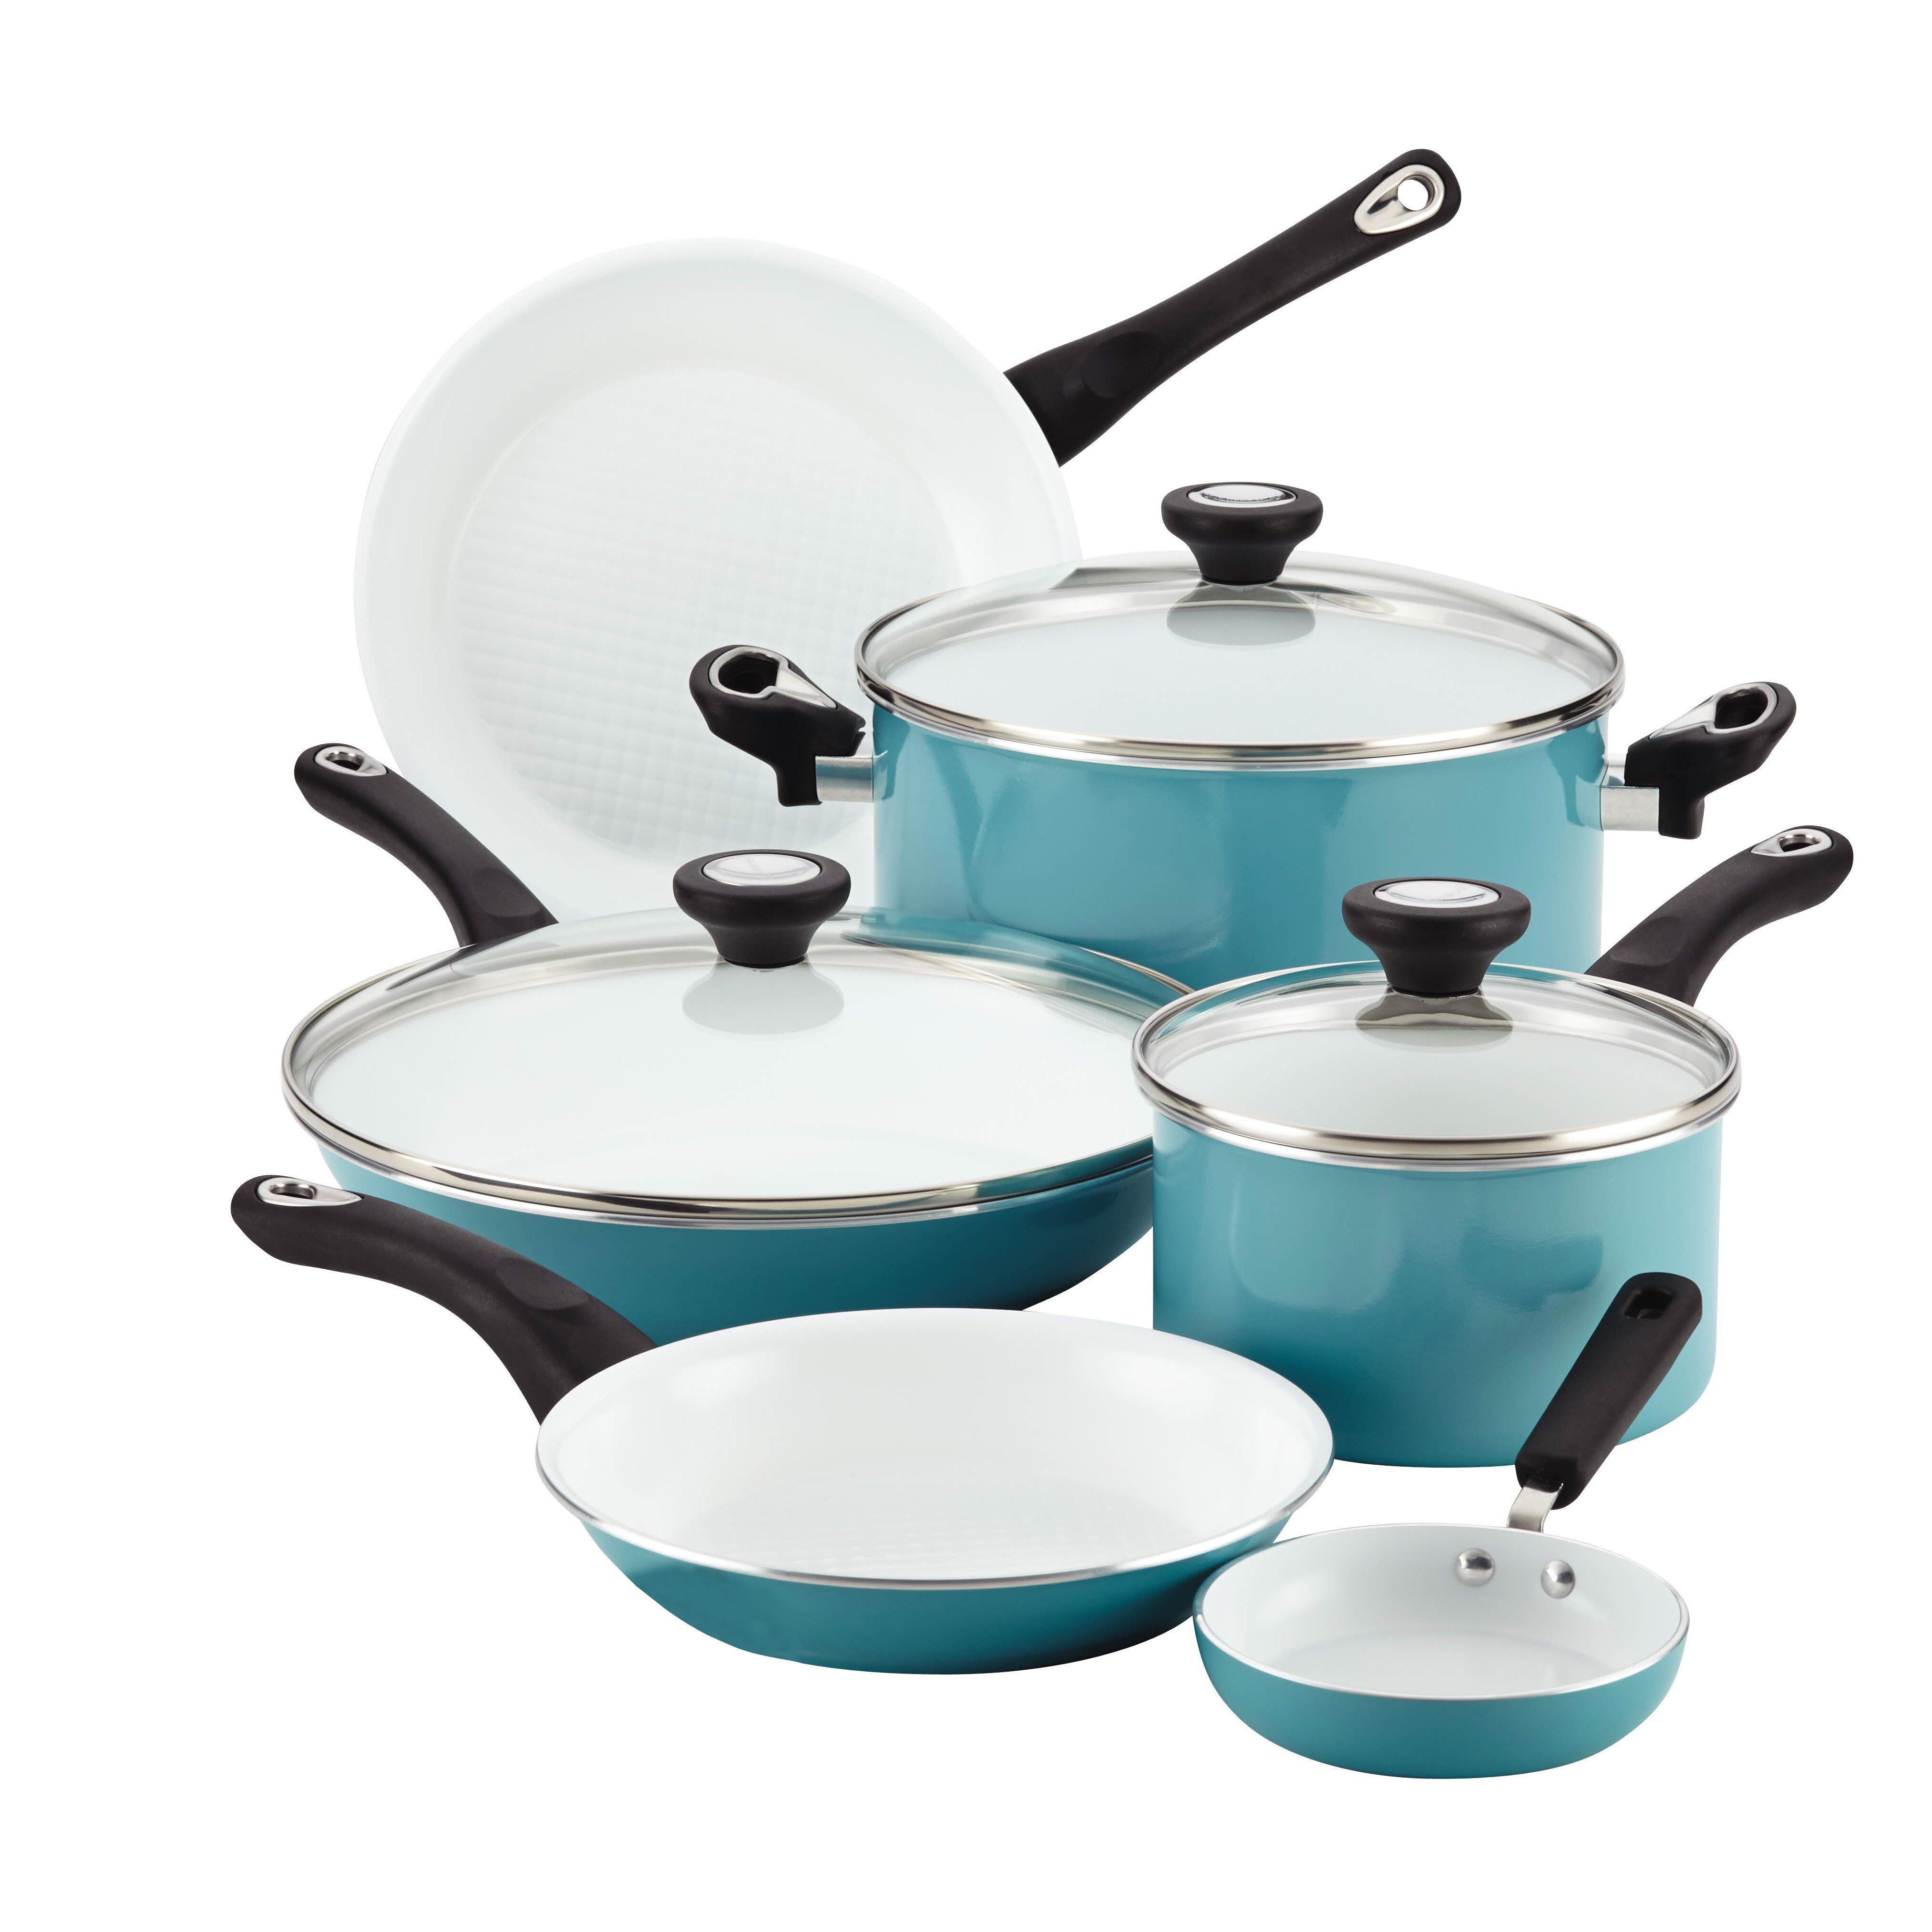 Farberware Purecook Ceramic Nonstick Cookware 12 Piece Cookware Set ...